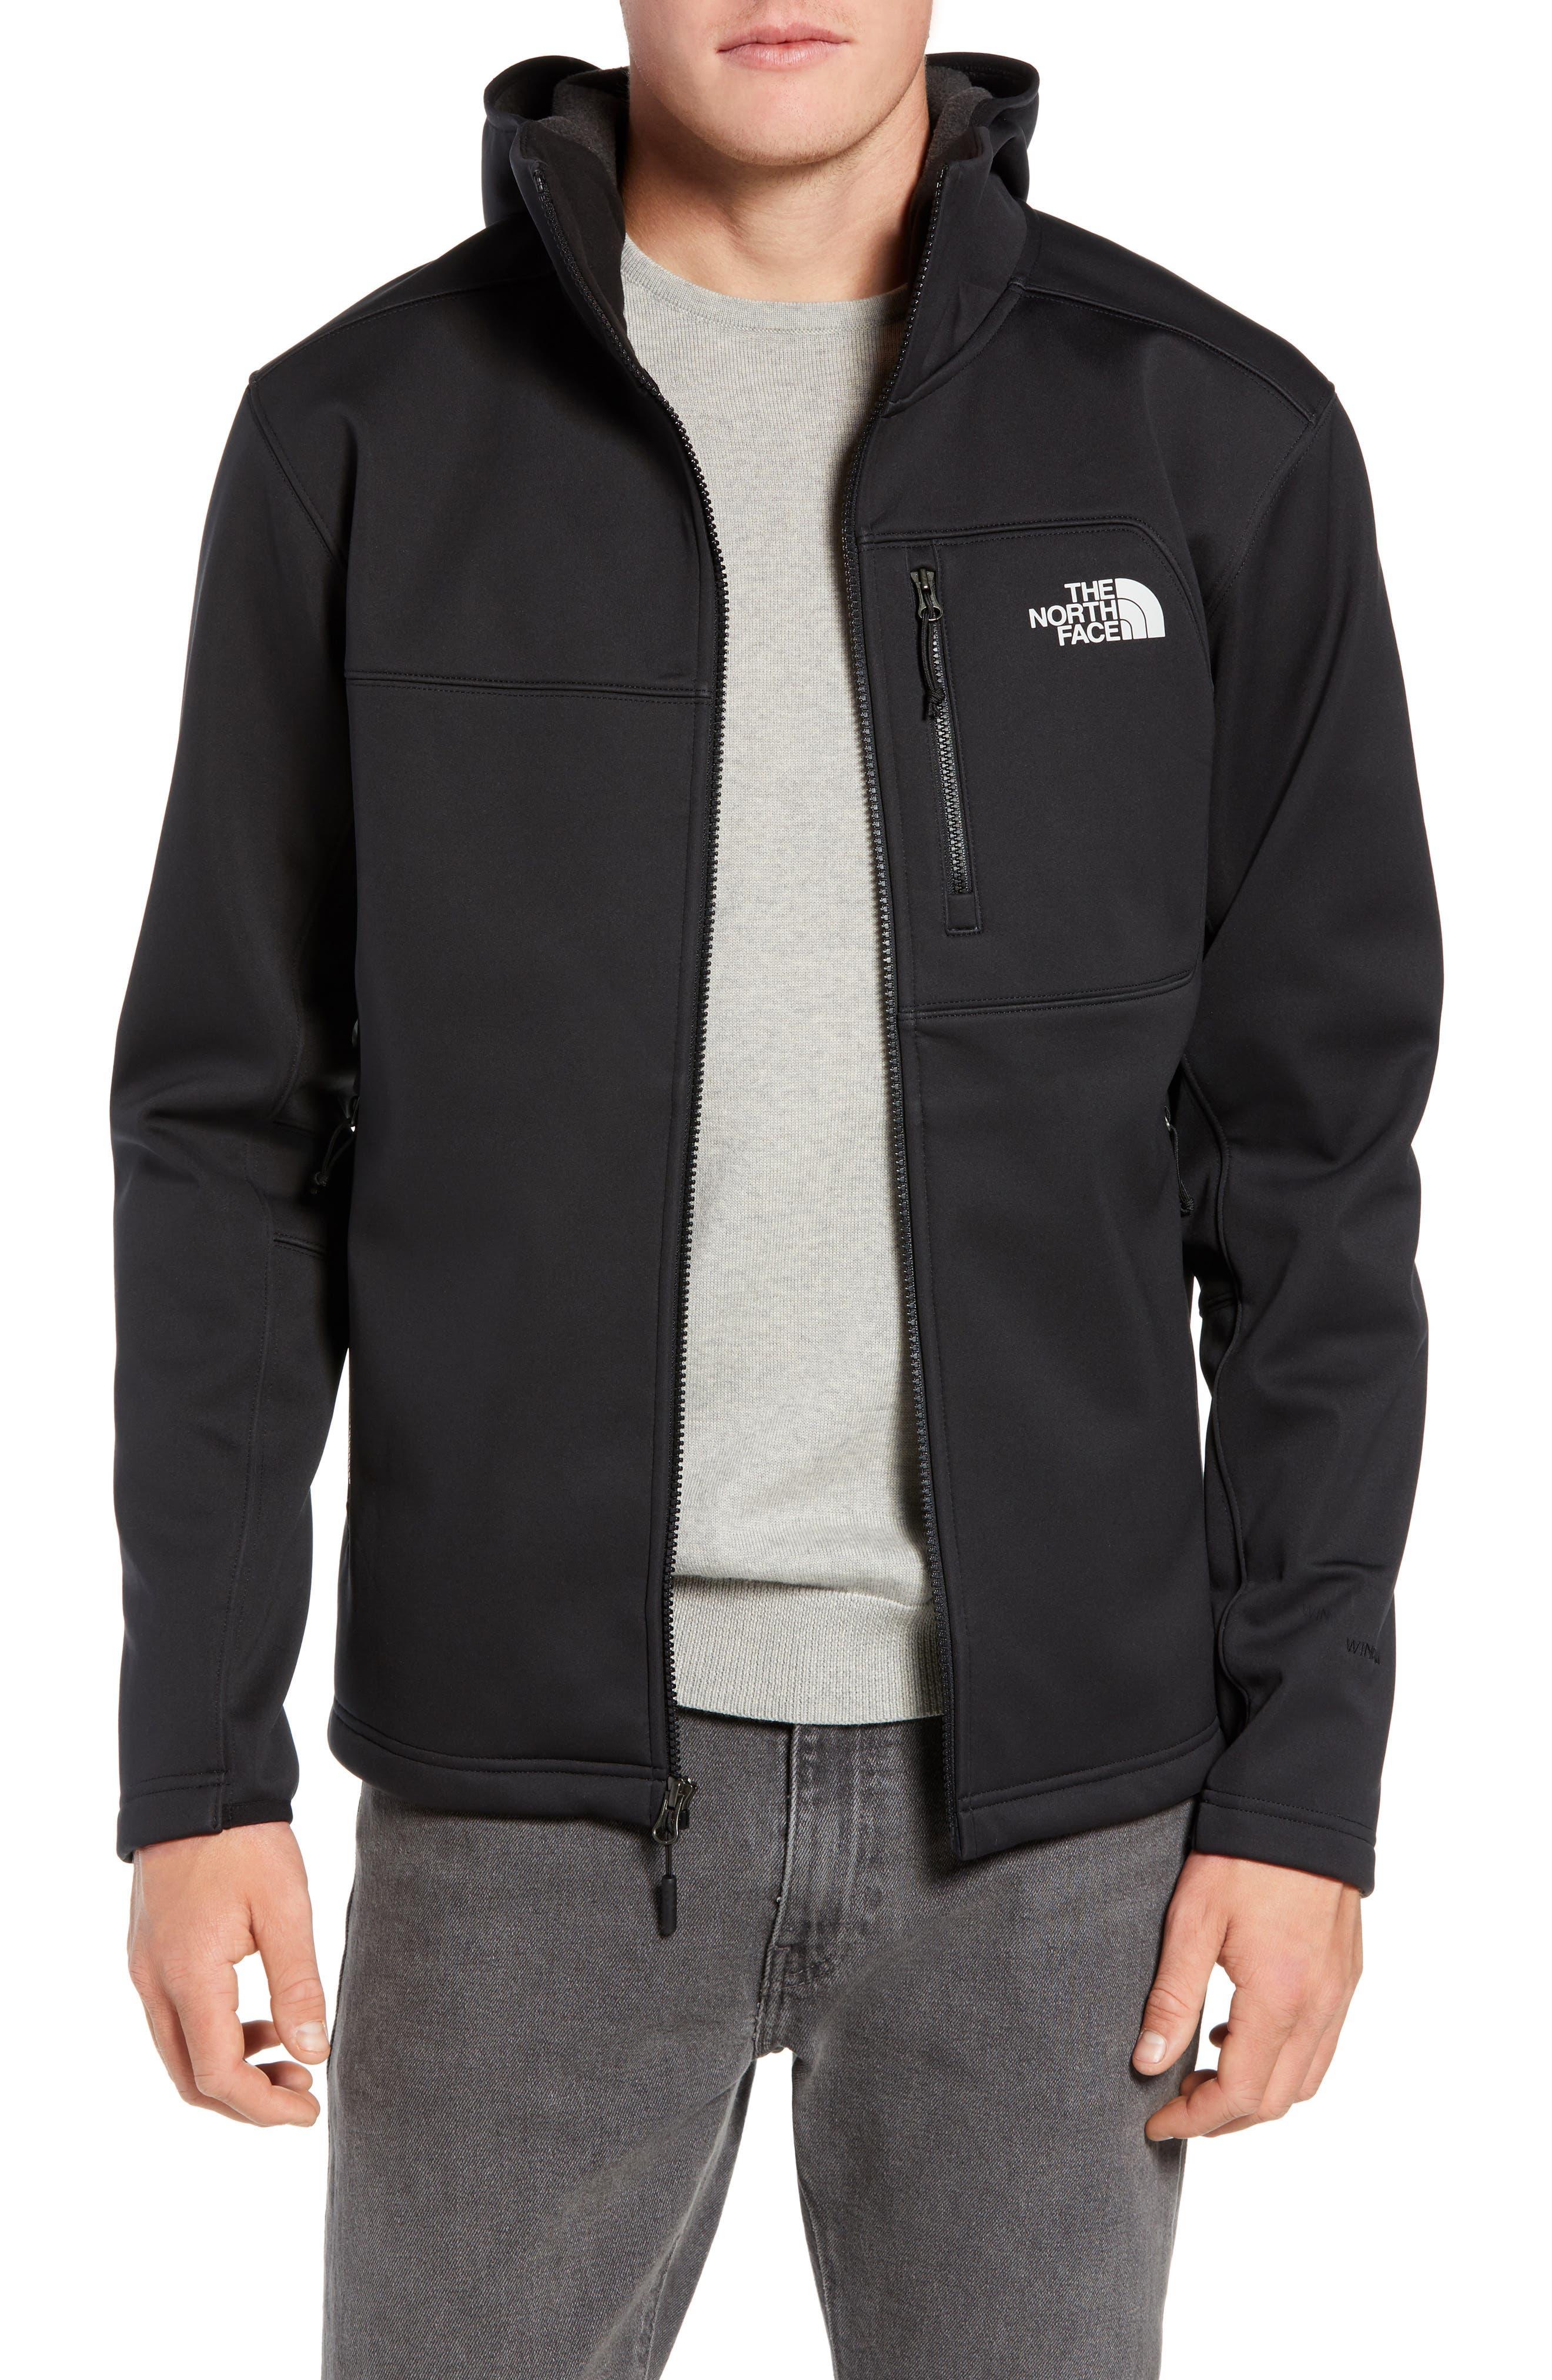 THE NORTH FACE,                             North Face Apex Risor Hooded Jacket,                             Main thumbnail 1, color,                             TNF BLACK/ TNF BLACK